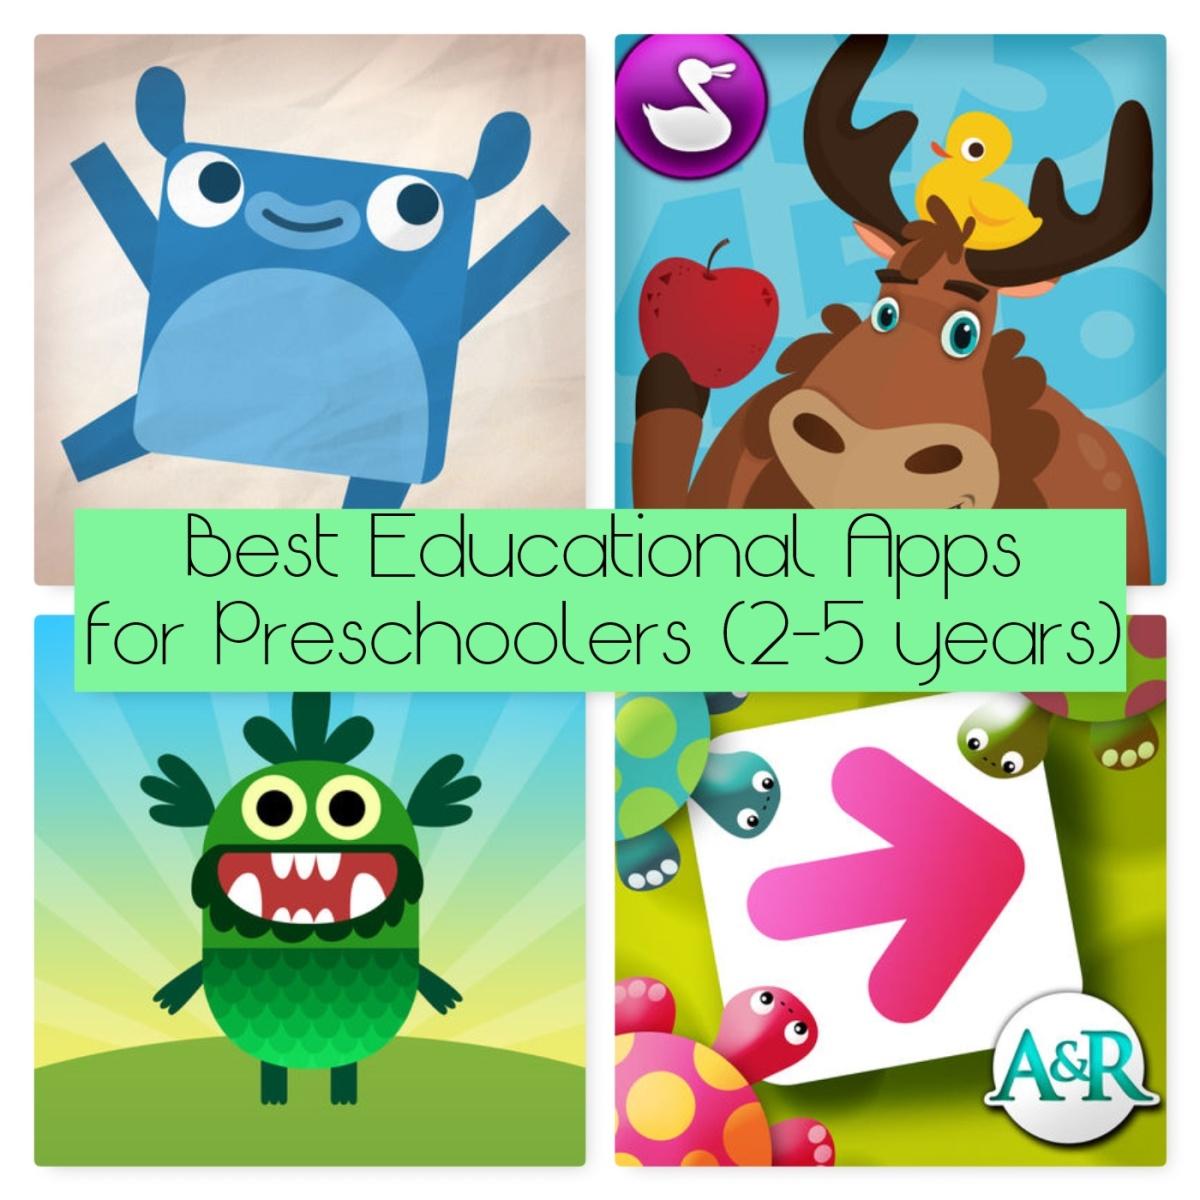 Best Educational Apps For Preschoolers (2-5 Years